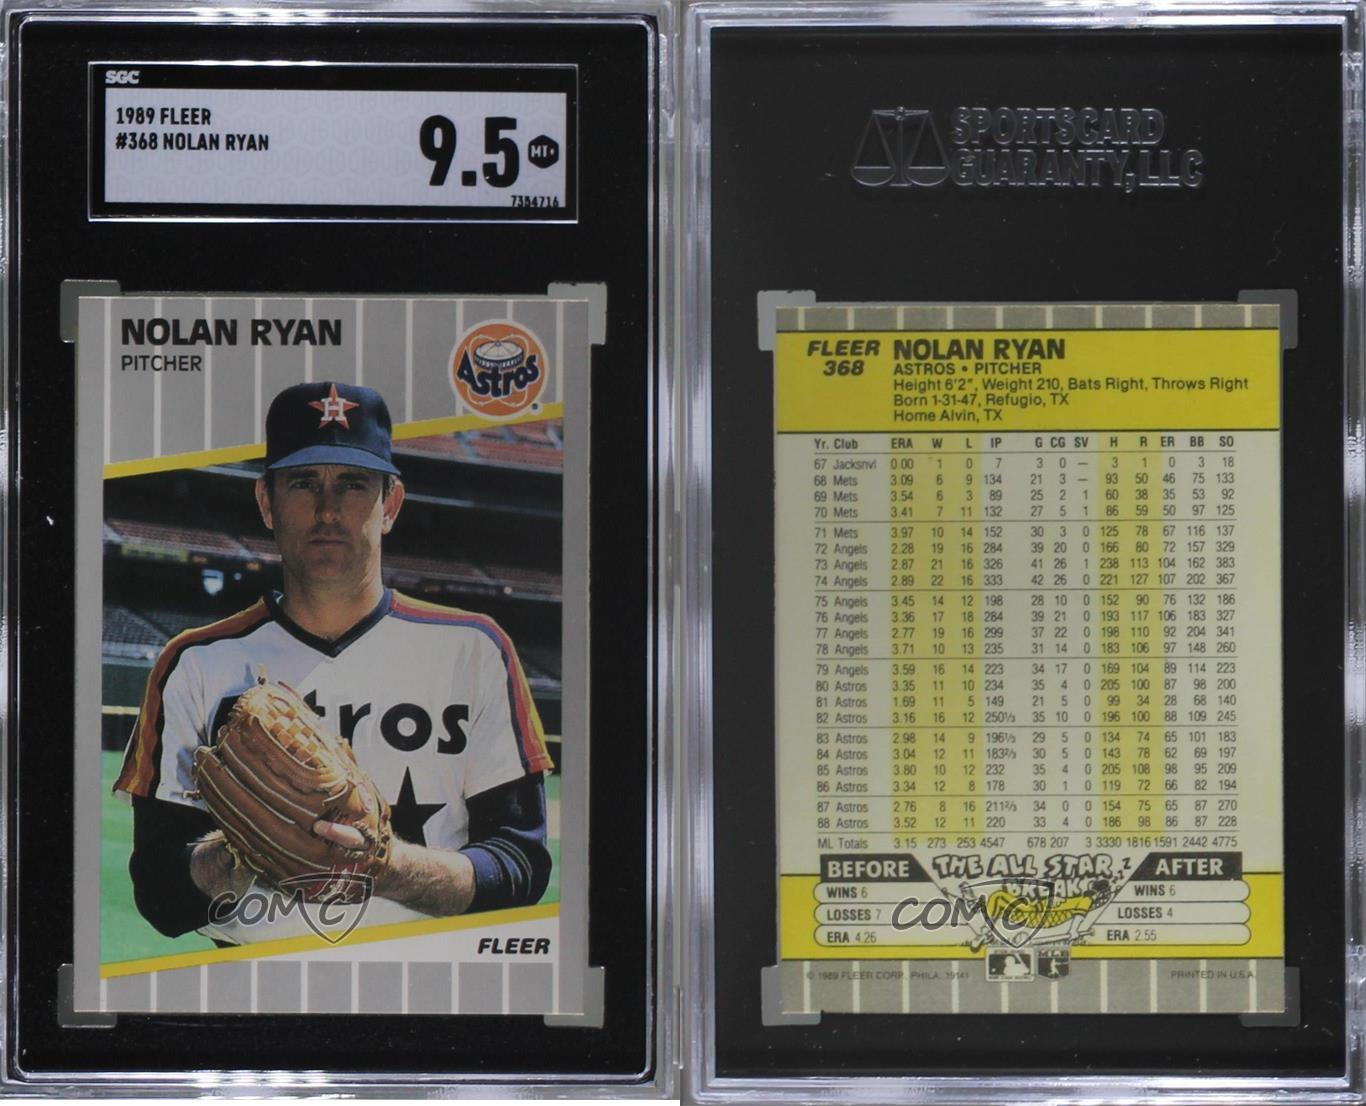 1989 Fleer # 368 Nolan Ryan Houston Astros Baseball Card